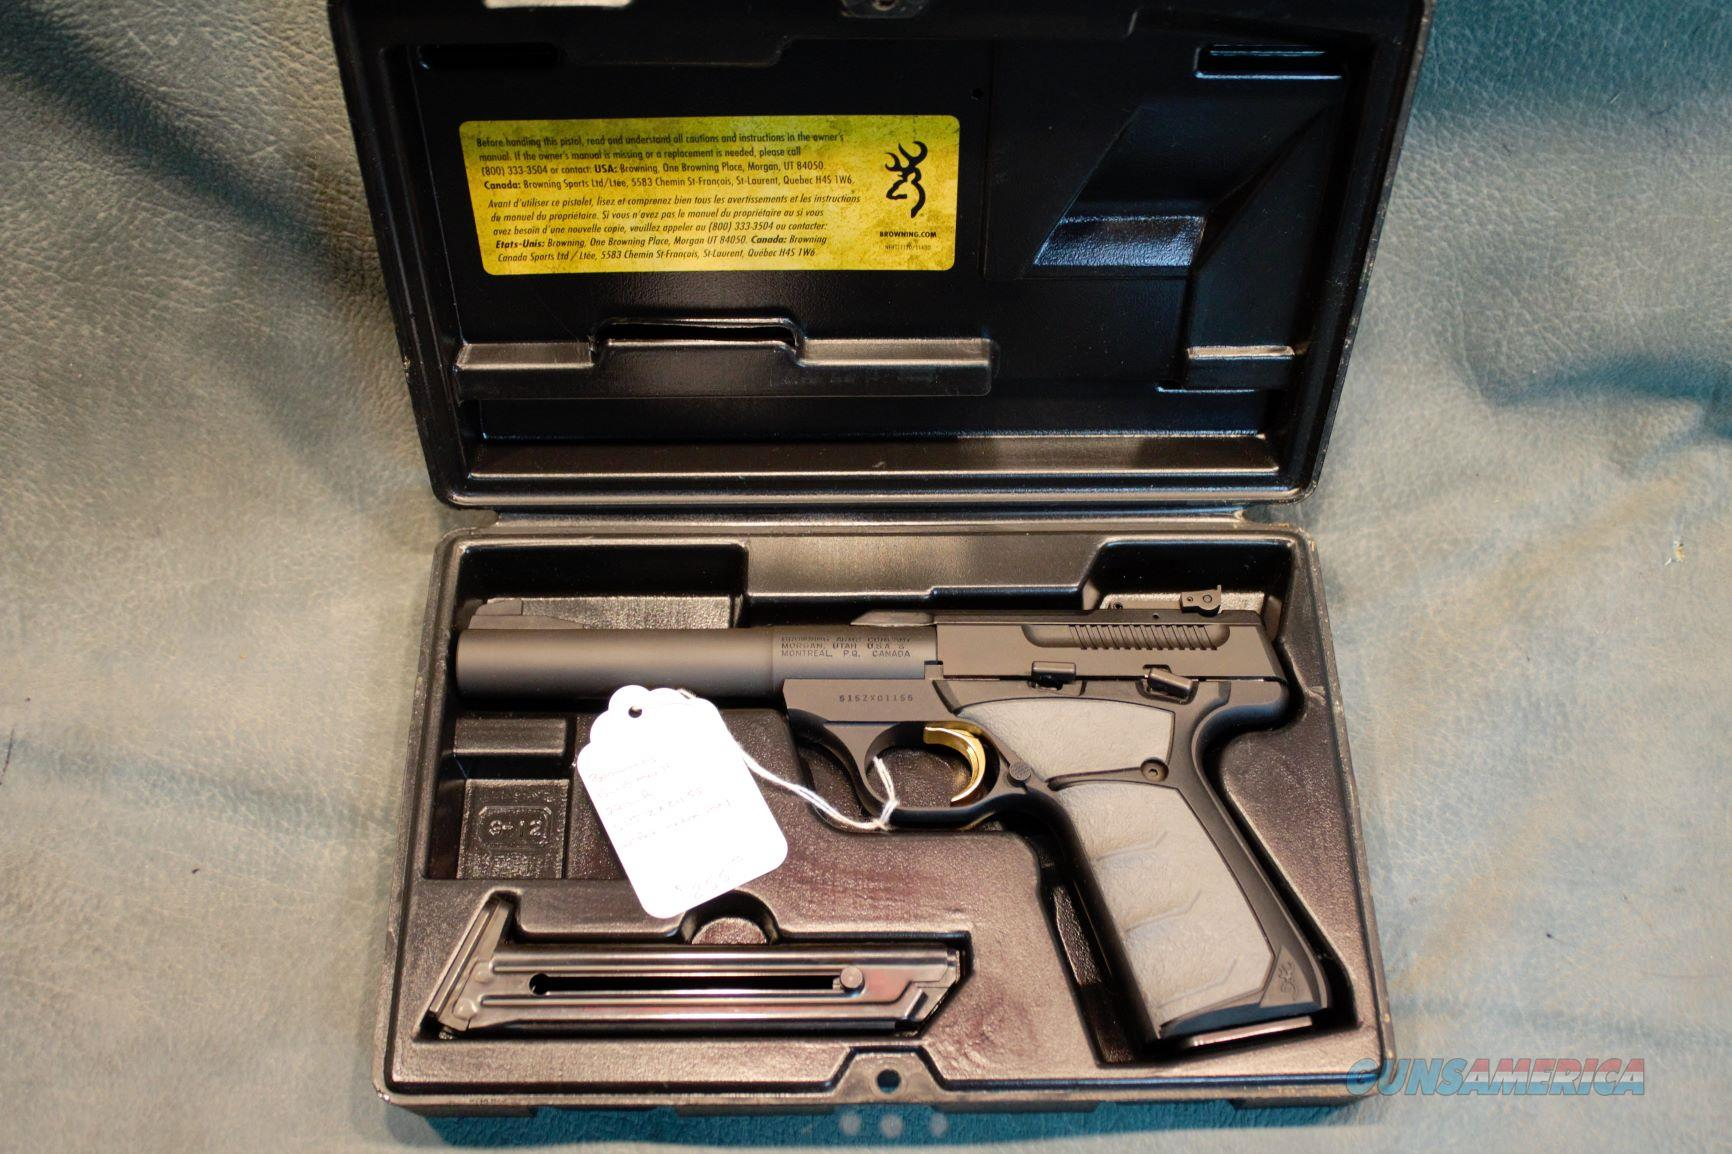 Browning Buckmark 22LR  Guns > Pistols > Browning Pistols > Buckmark